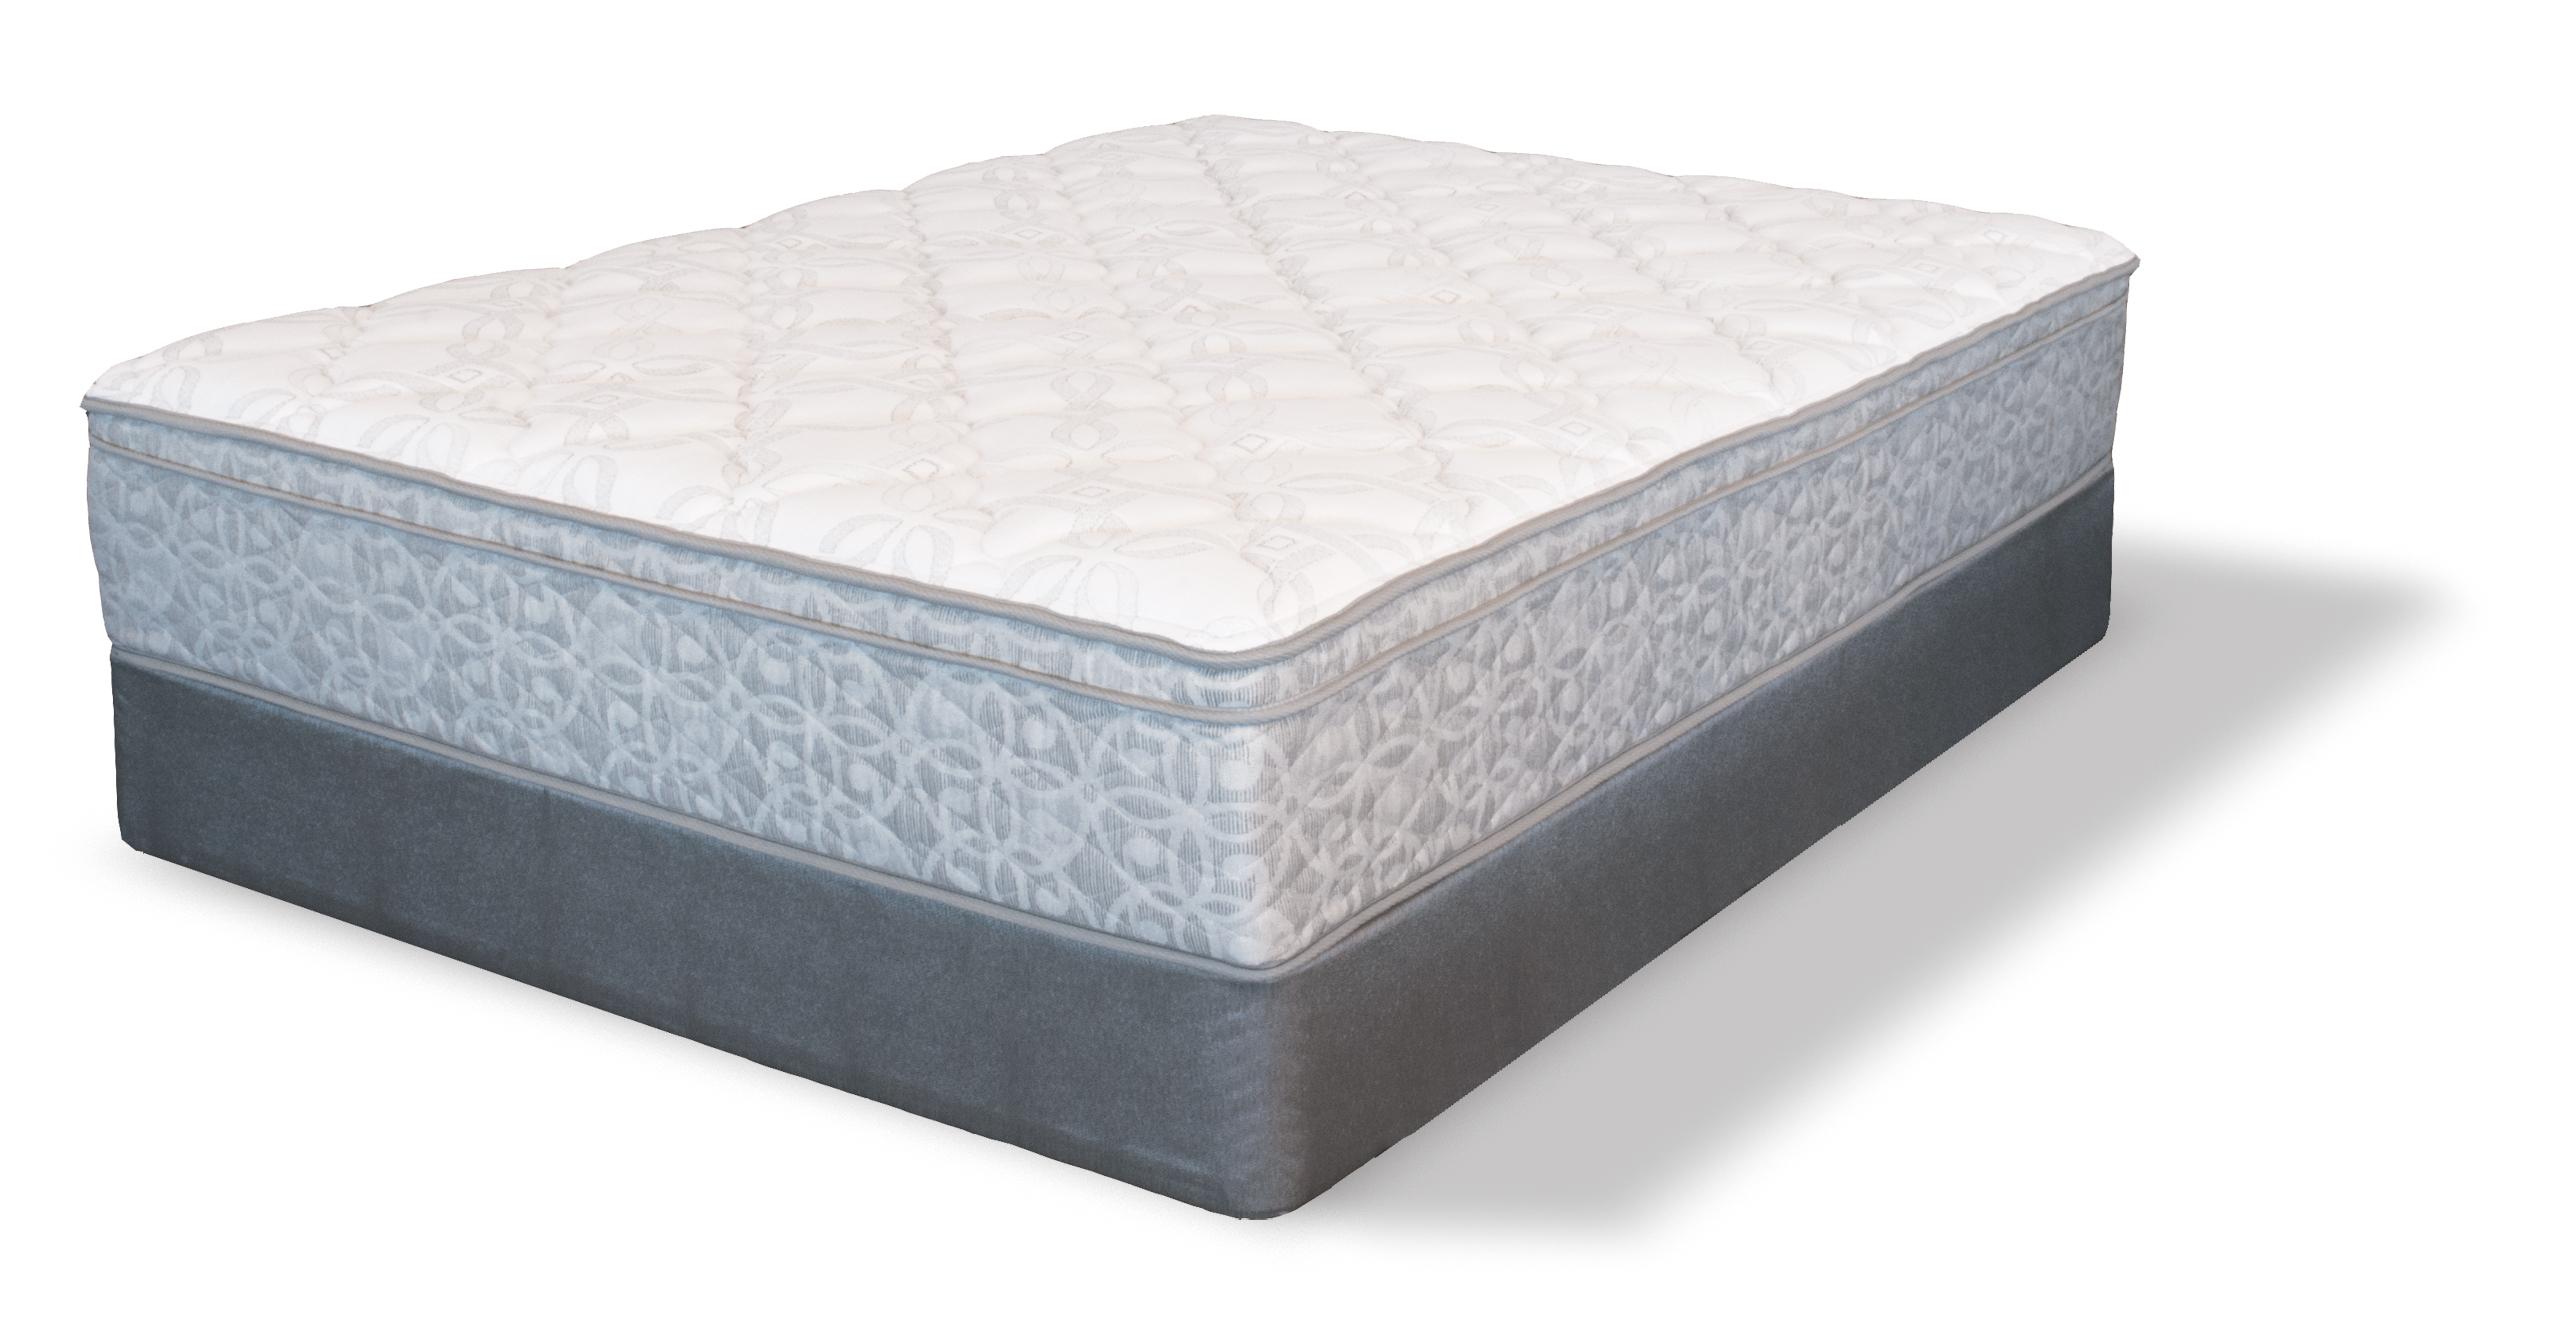 Tempur Pedic Queen Mattress Topper Home › Coupon › Serta Gatlinburg Euro Pillow Top Queen Set